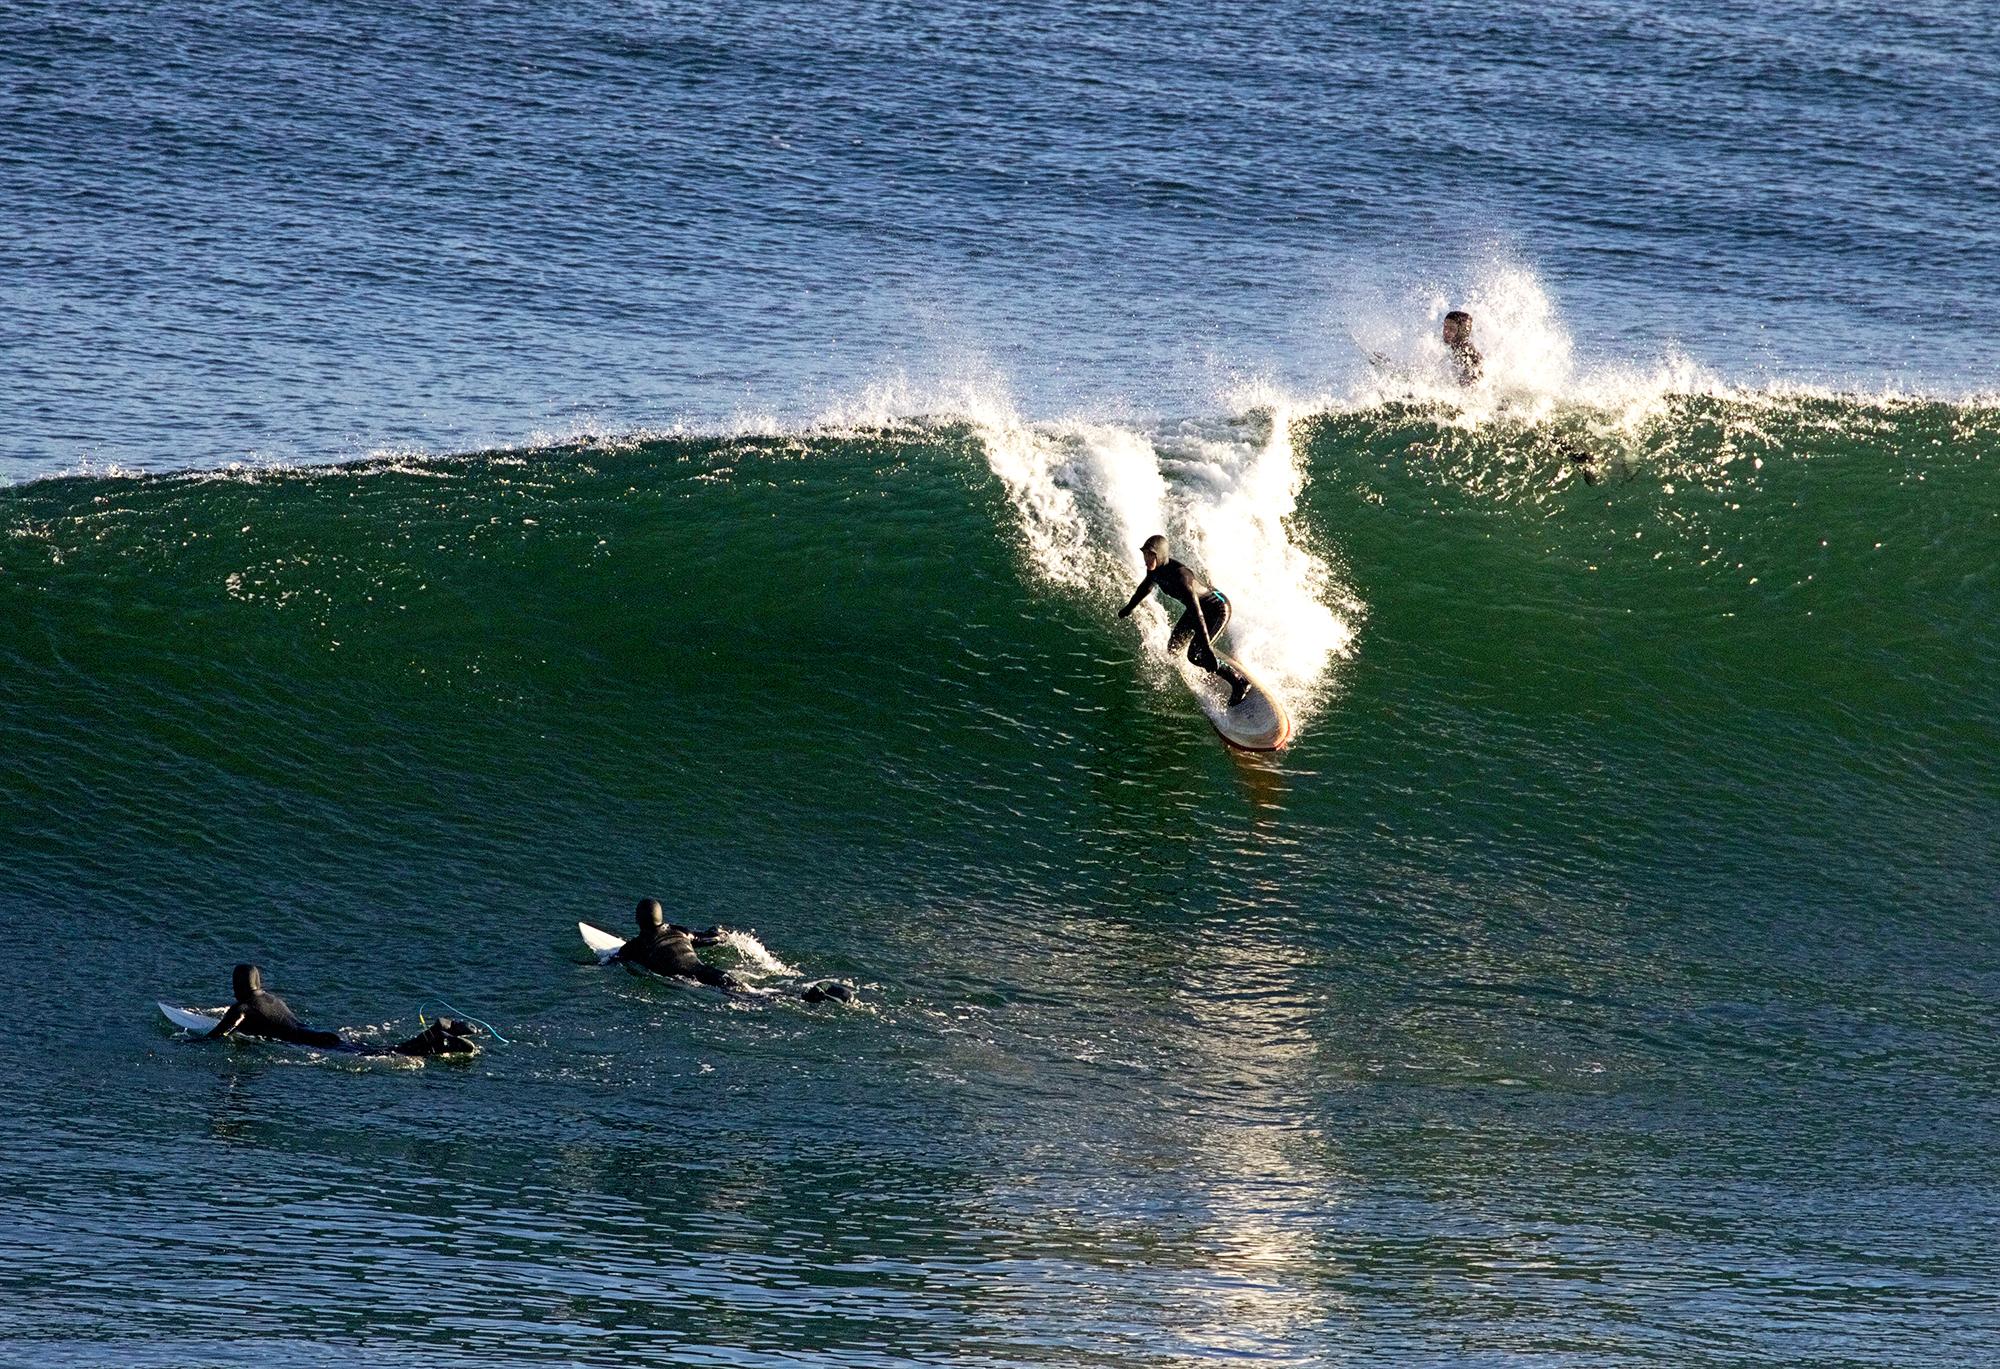 1-19-17 MTK Surfer 28.jpg